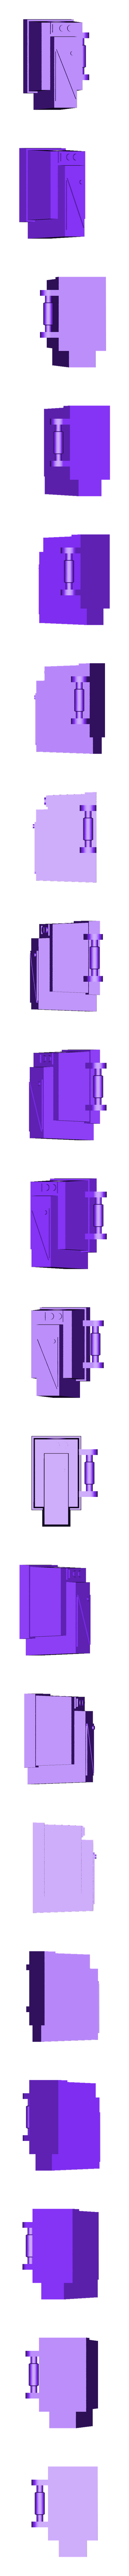 HWT_Lascannon_battery.stl Download free STL file Lascannon (Heavy weapon team) • Model to 3D print, Solutionlesn